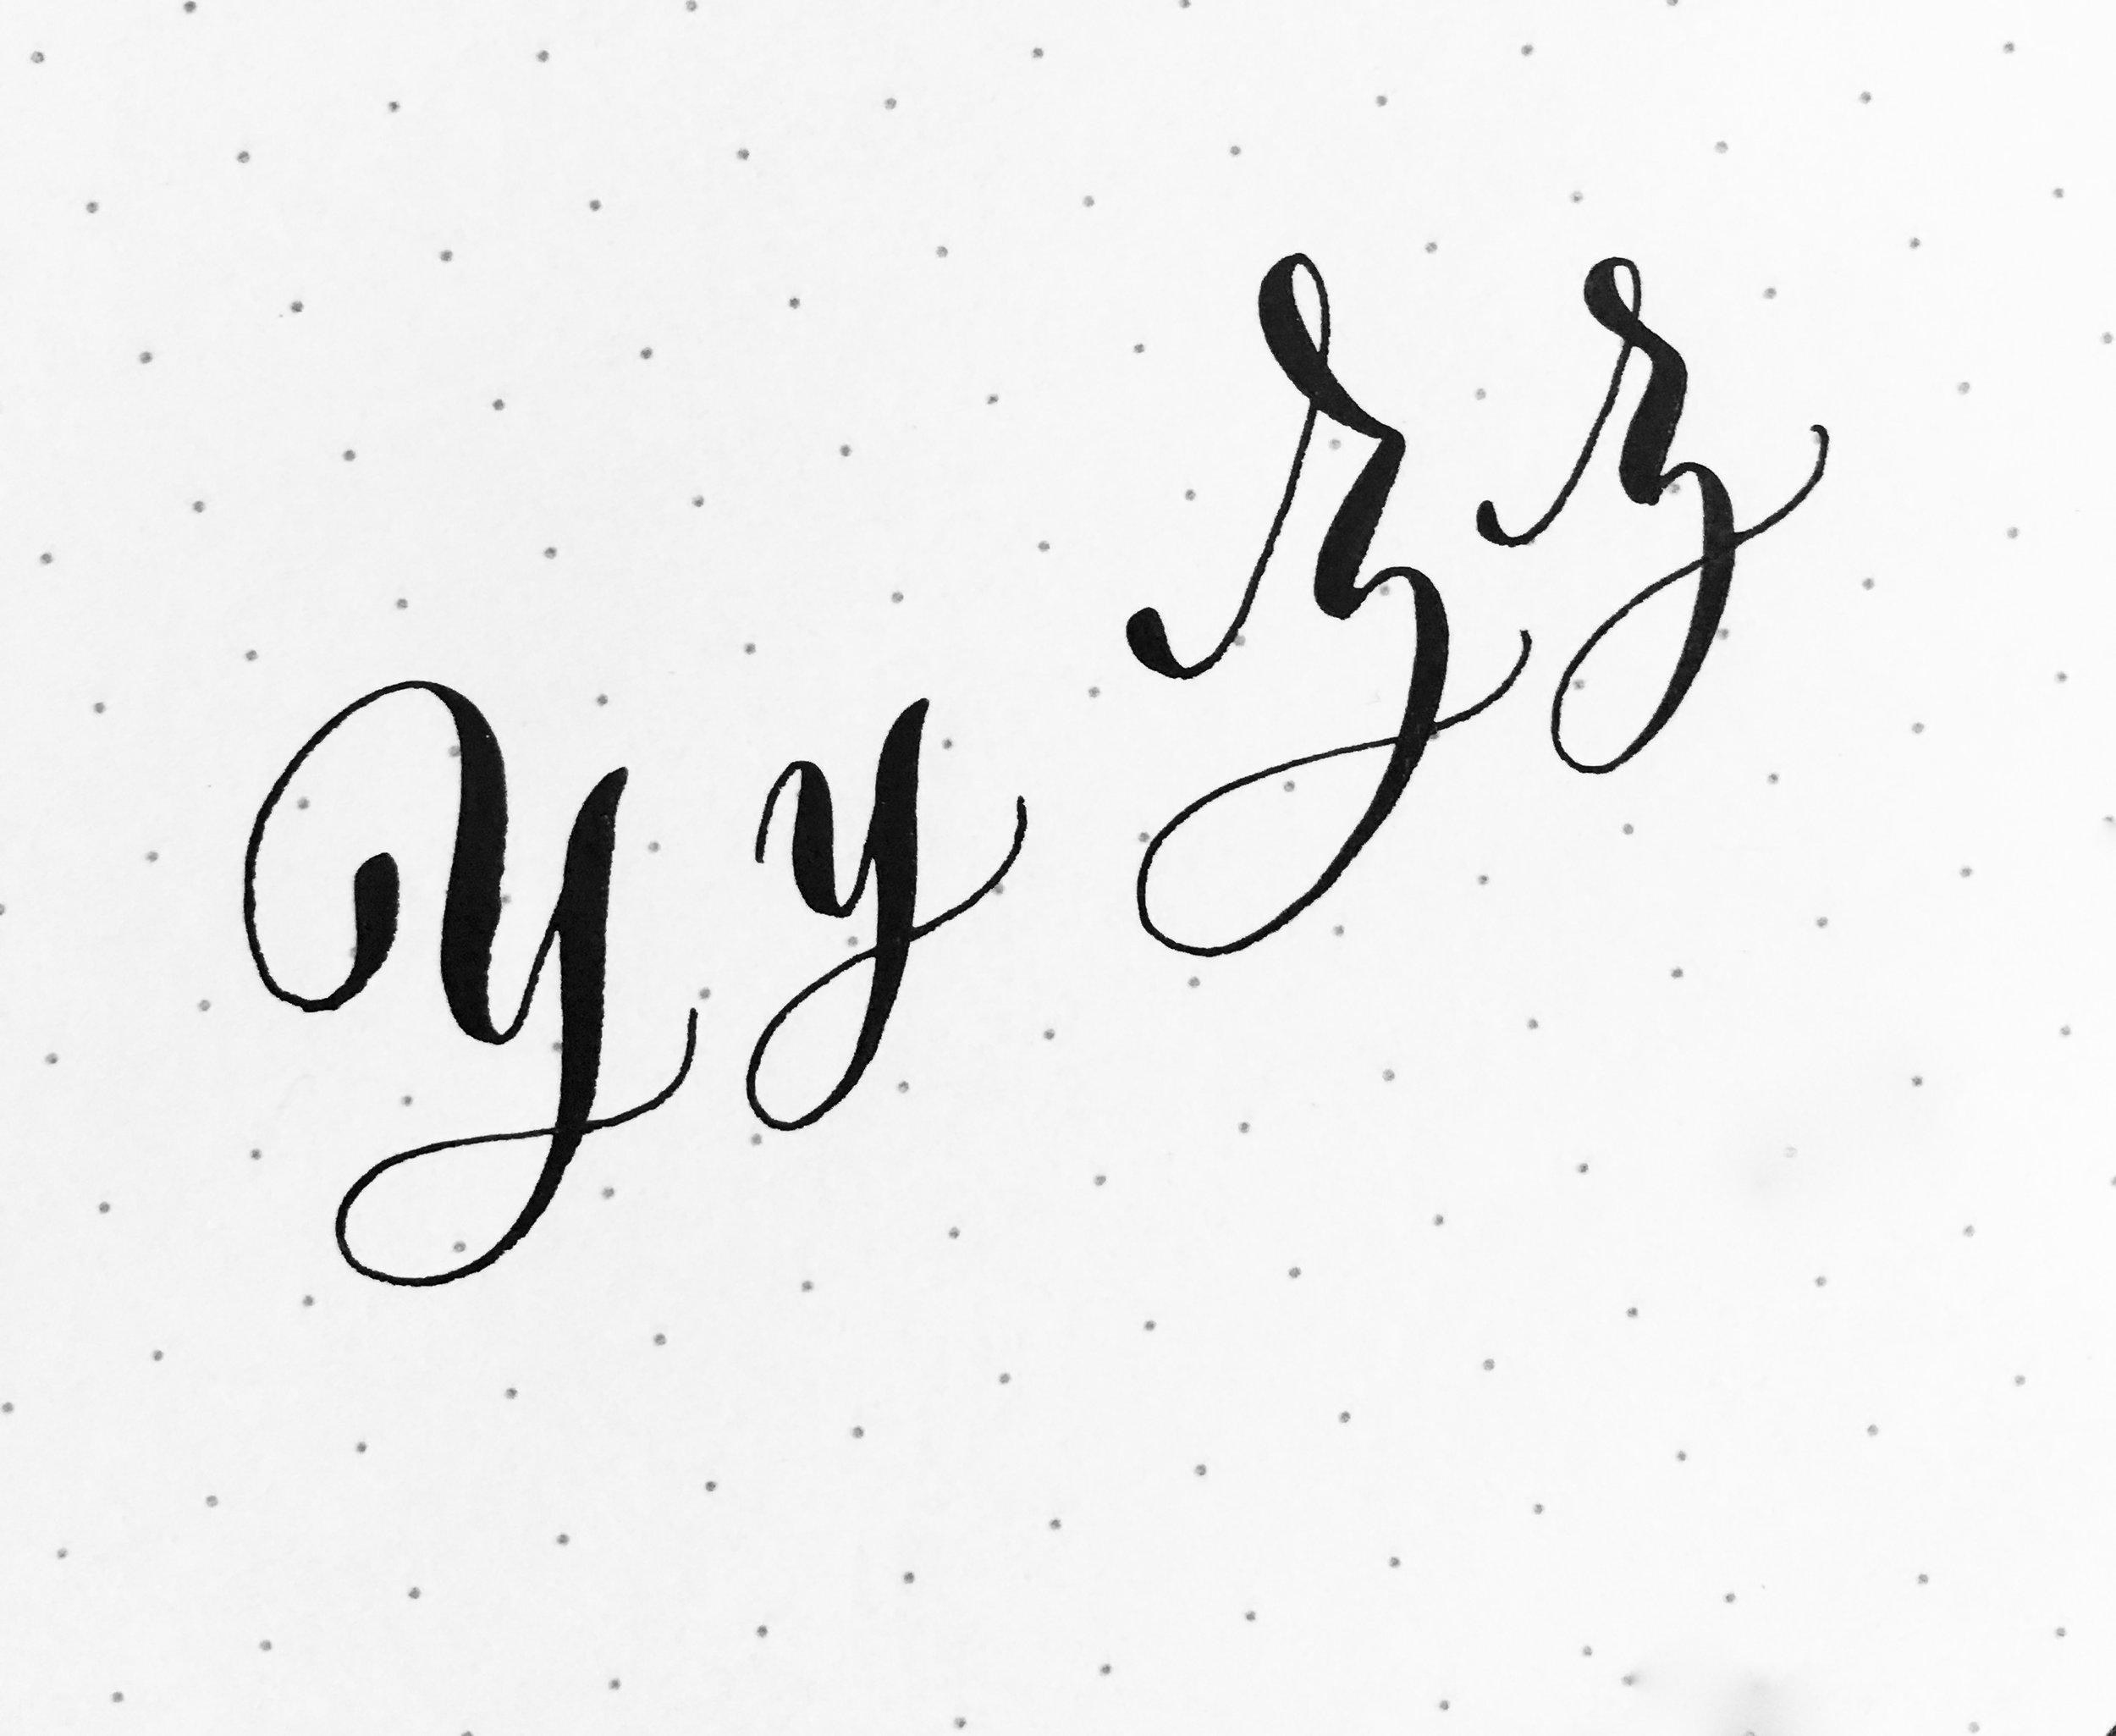 calligraphy_Y_through_Z.jpg